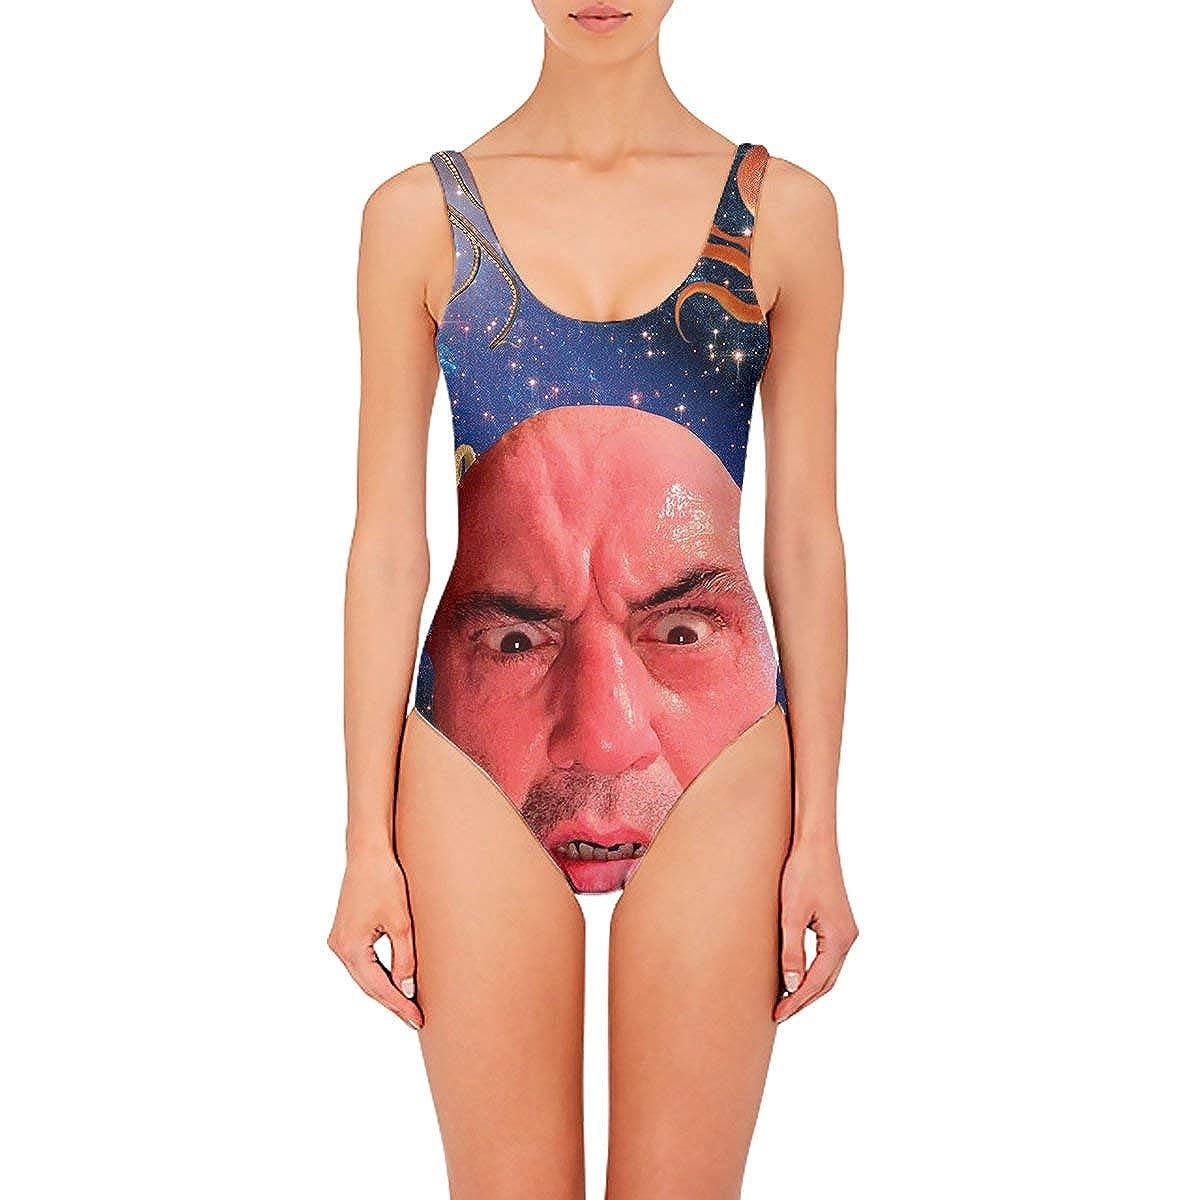 Beloved Shirts Joe Rogan Octopus Meme One Piece Swimsuit